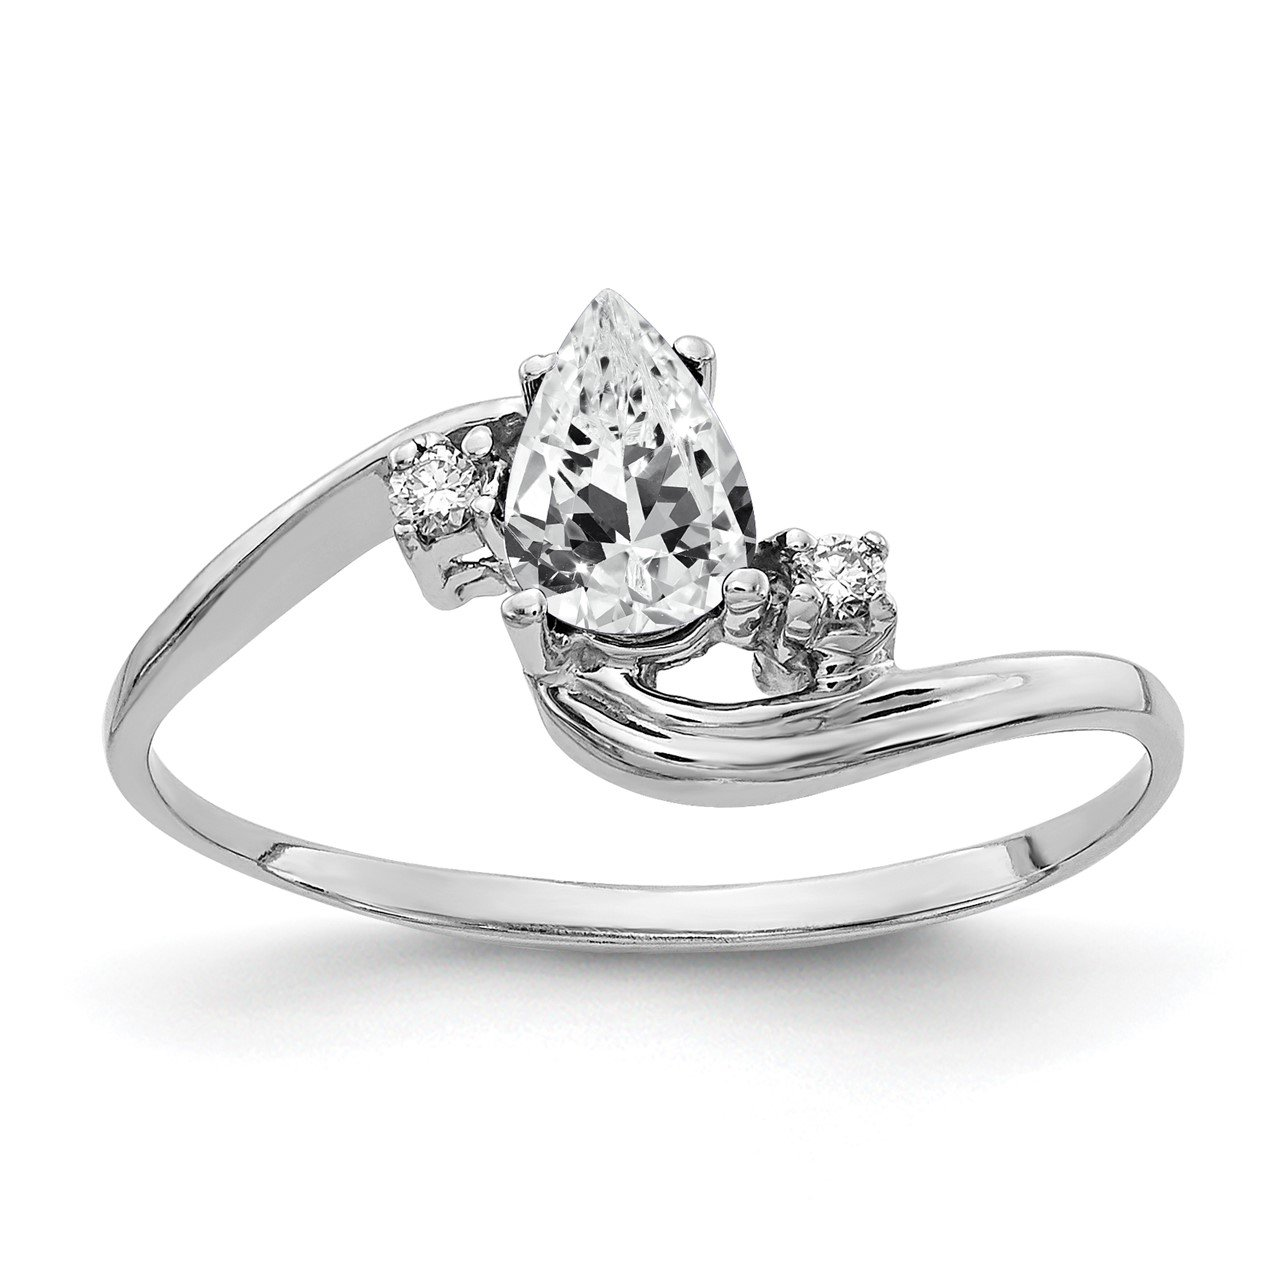 14k White Gold 6x4mm Pear Cubic Zirconia AAA Diamond ring